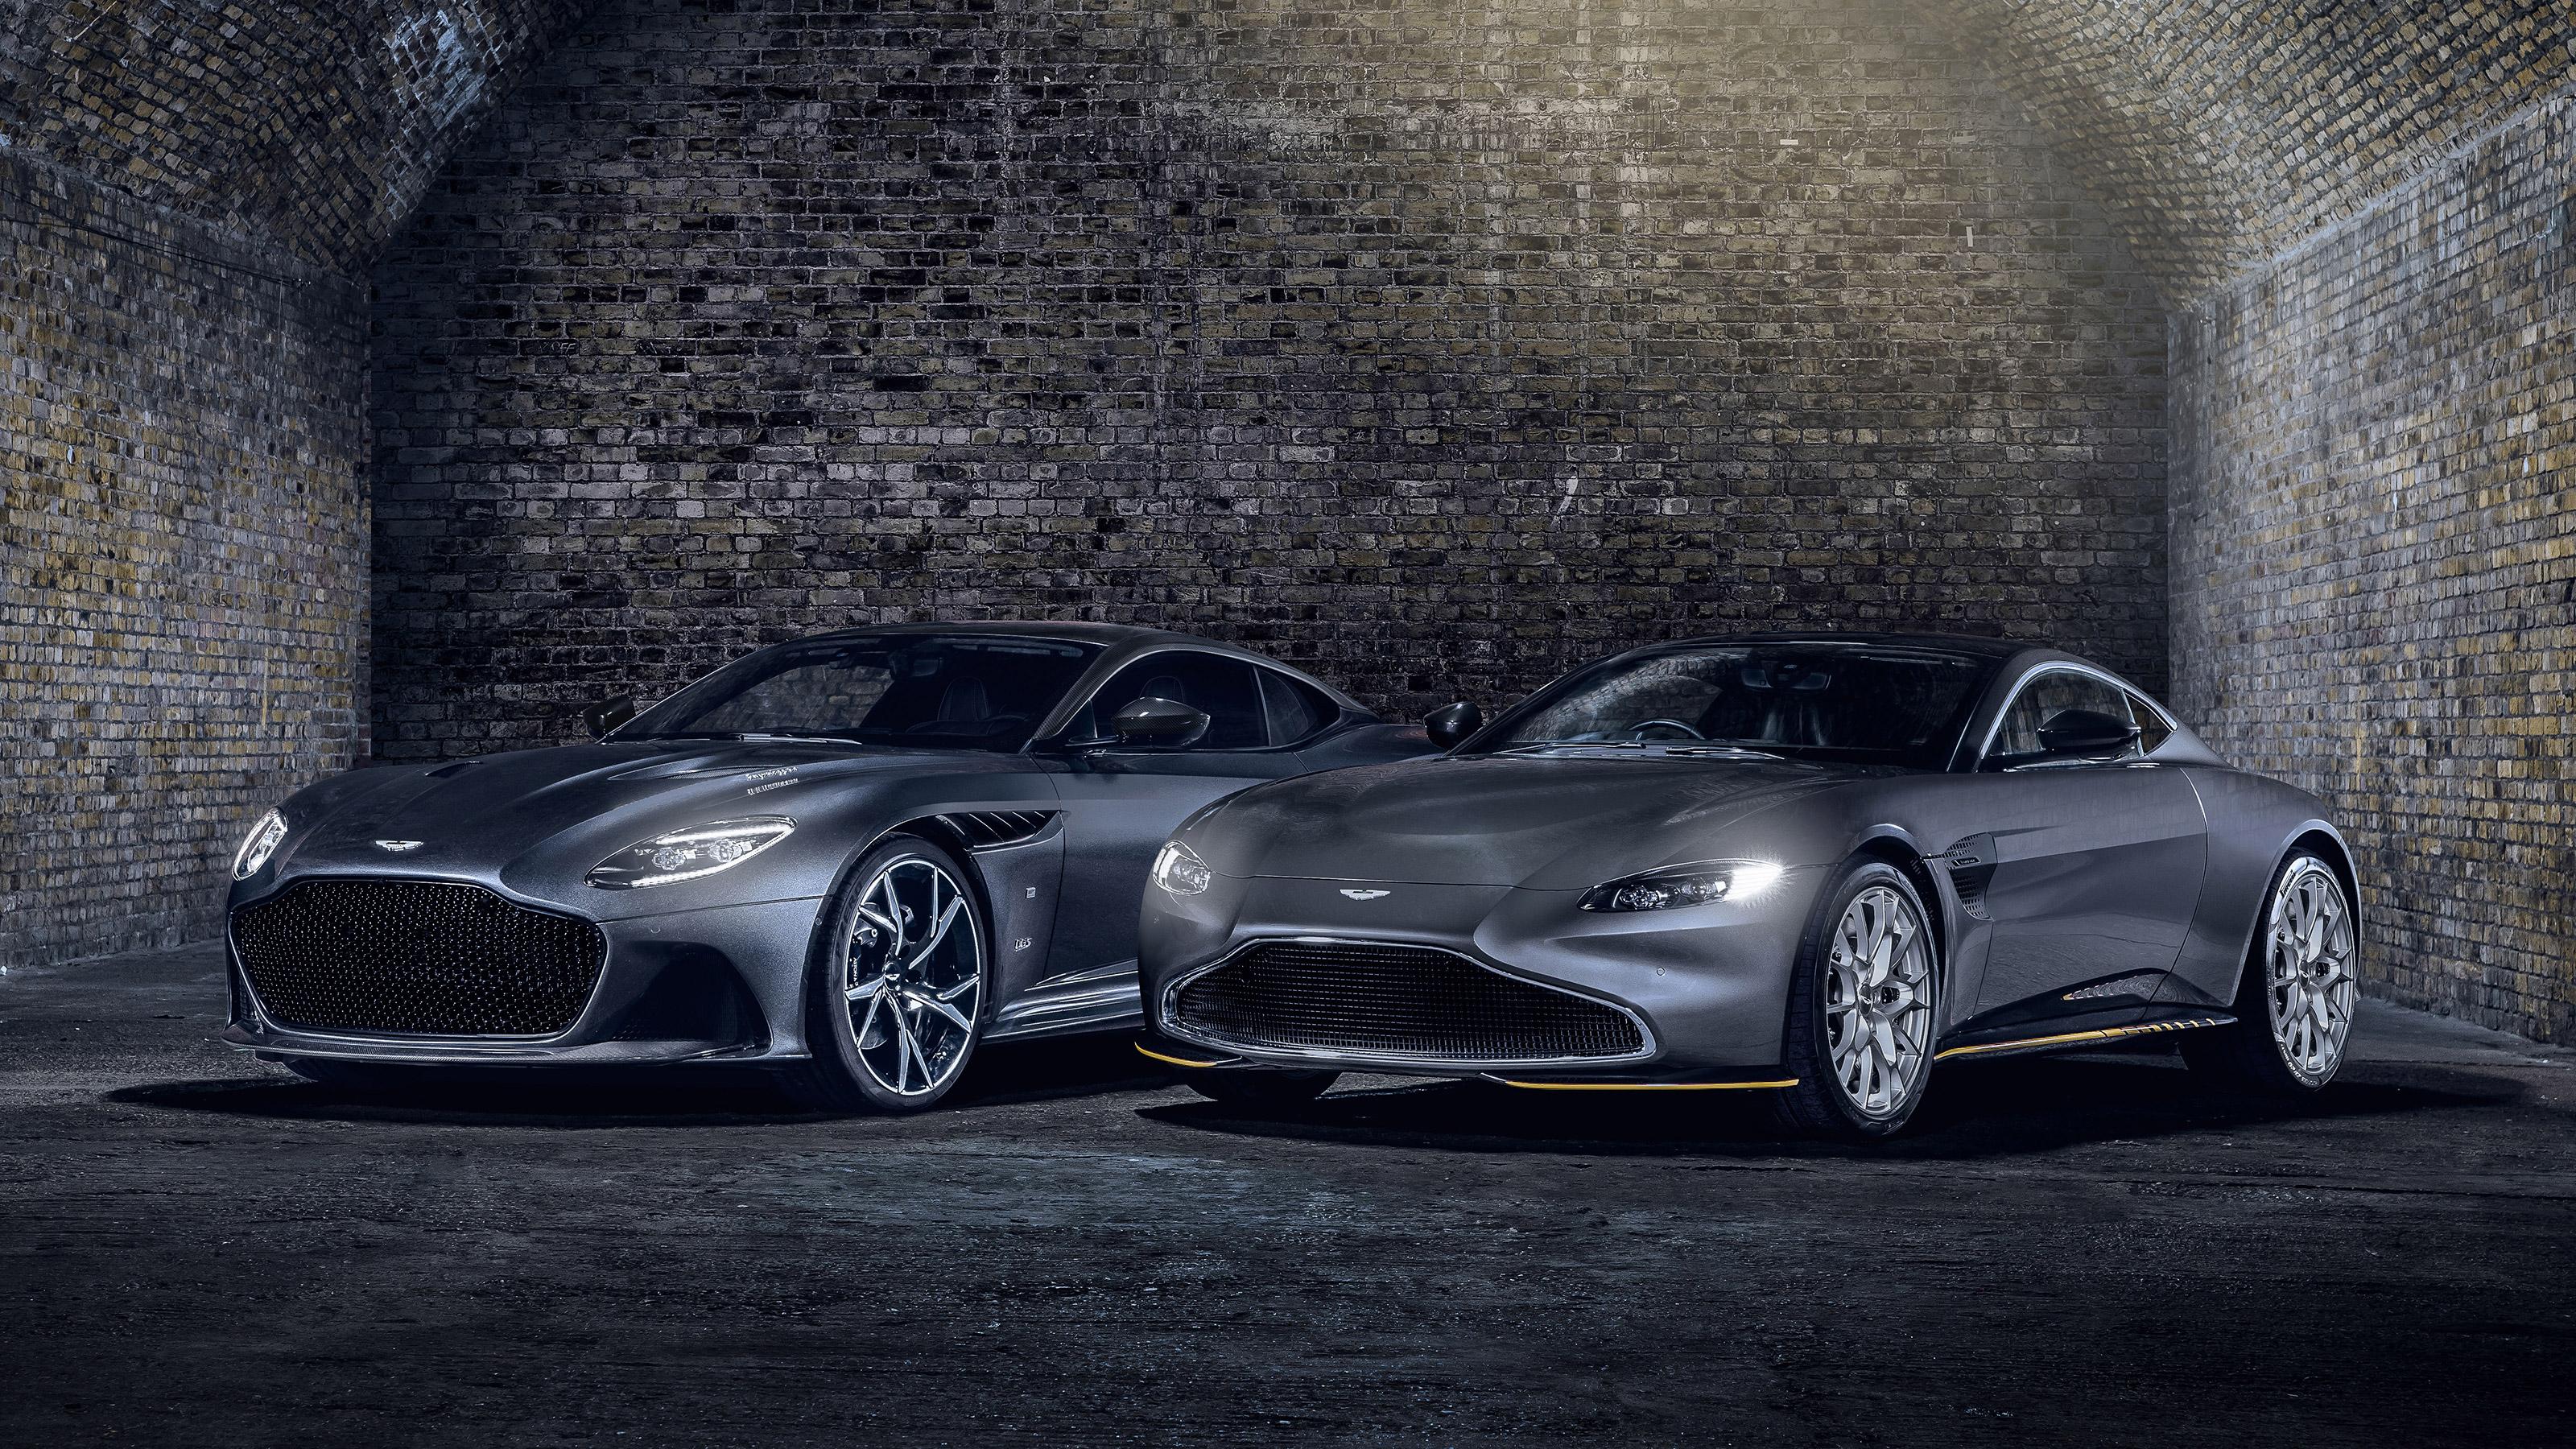 Aston Martin 007 Editions Revealed Vantage And Dbs Superleggera Get The Q Treatment Evo